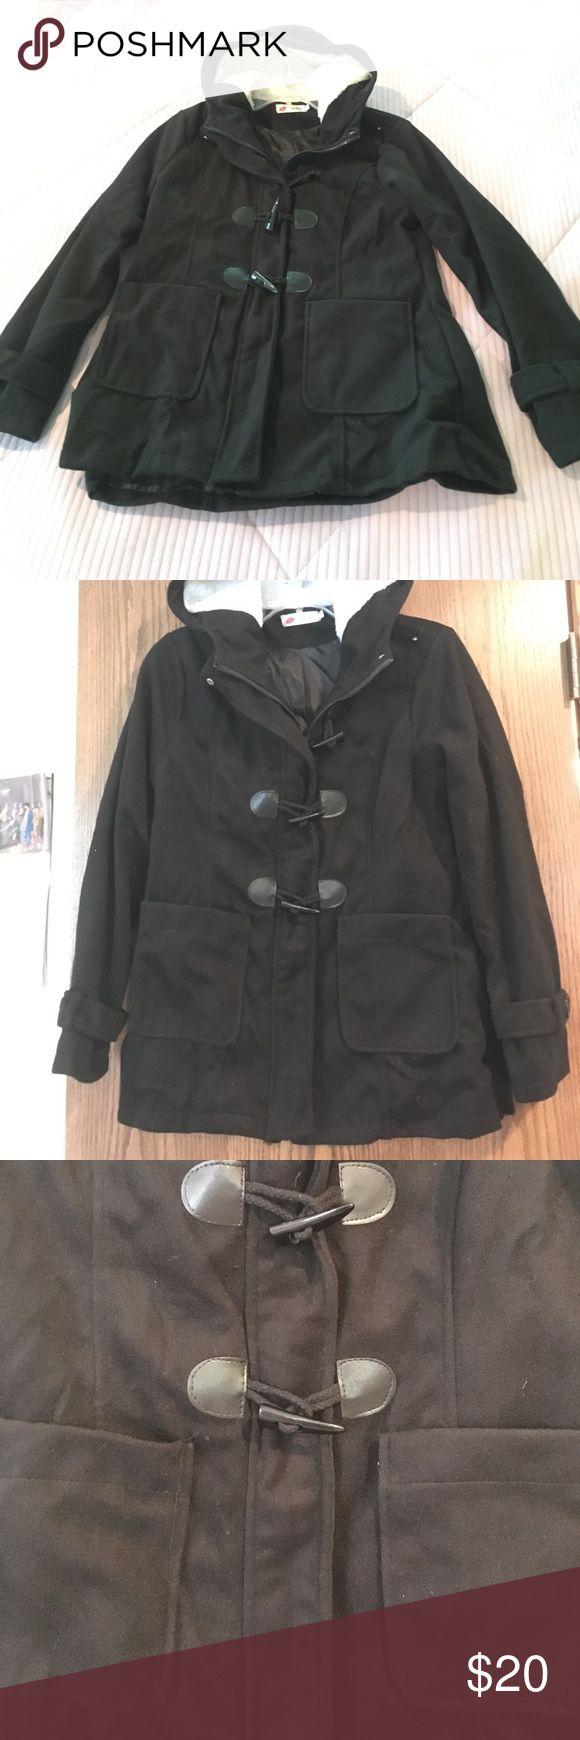 Pocketed wool pea coat Never worn black long pocketed winter pea coat Jackets & Coats Pea Coats